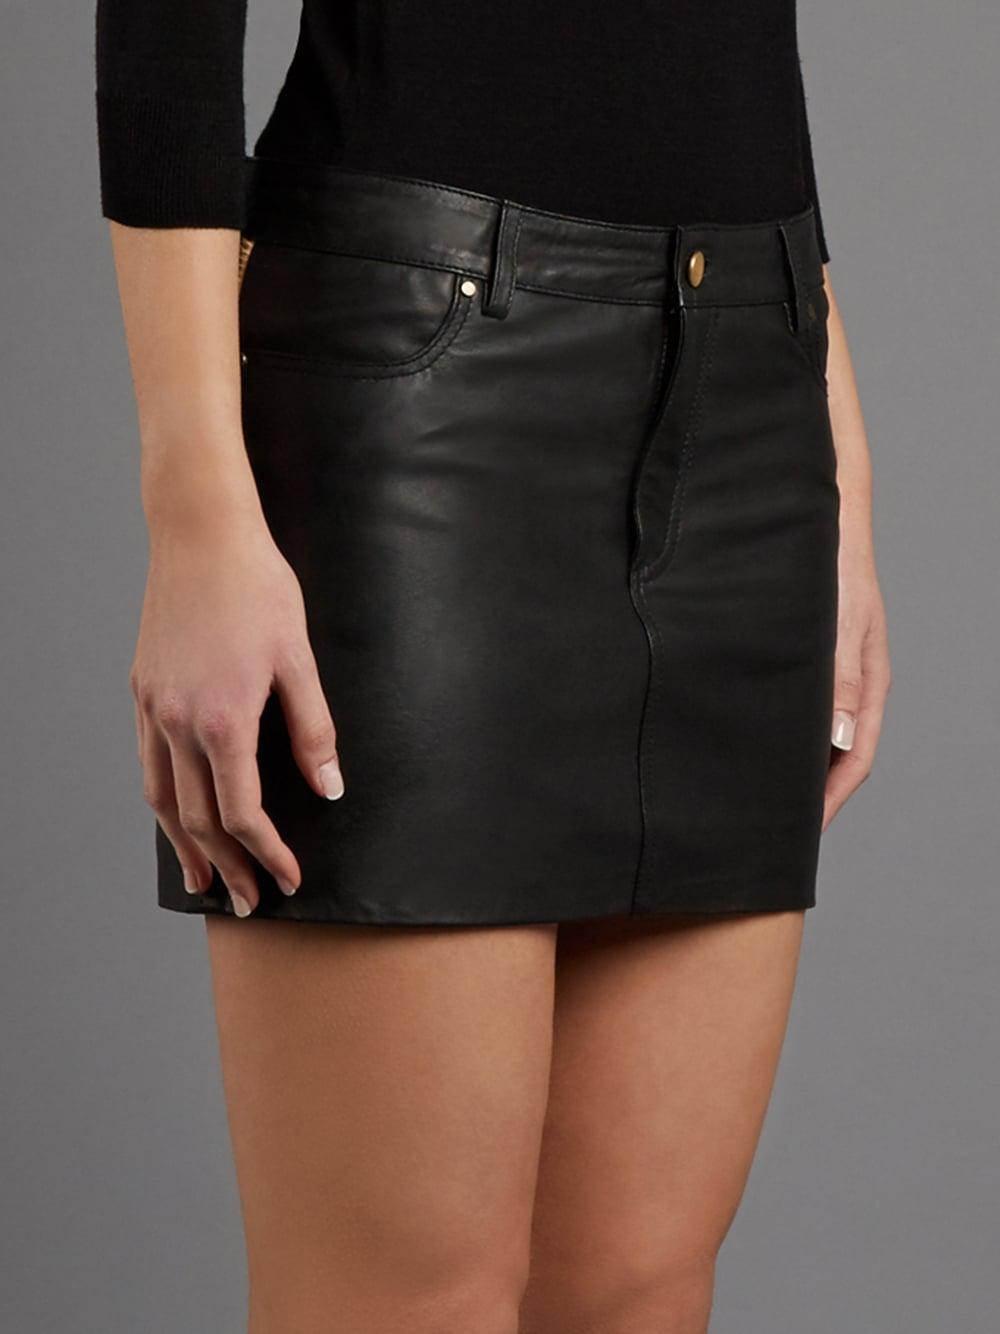 elegant appearance later release info on Lele Leopard Print and Black Leather Mini Skirt